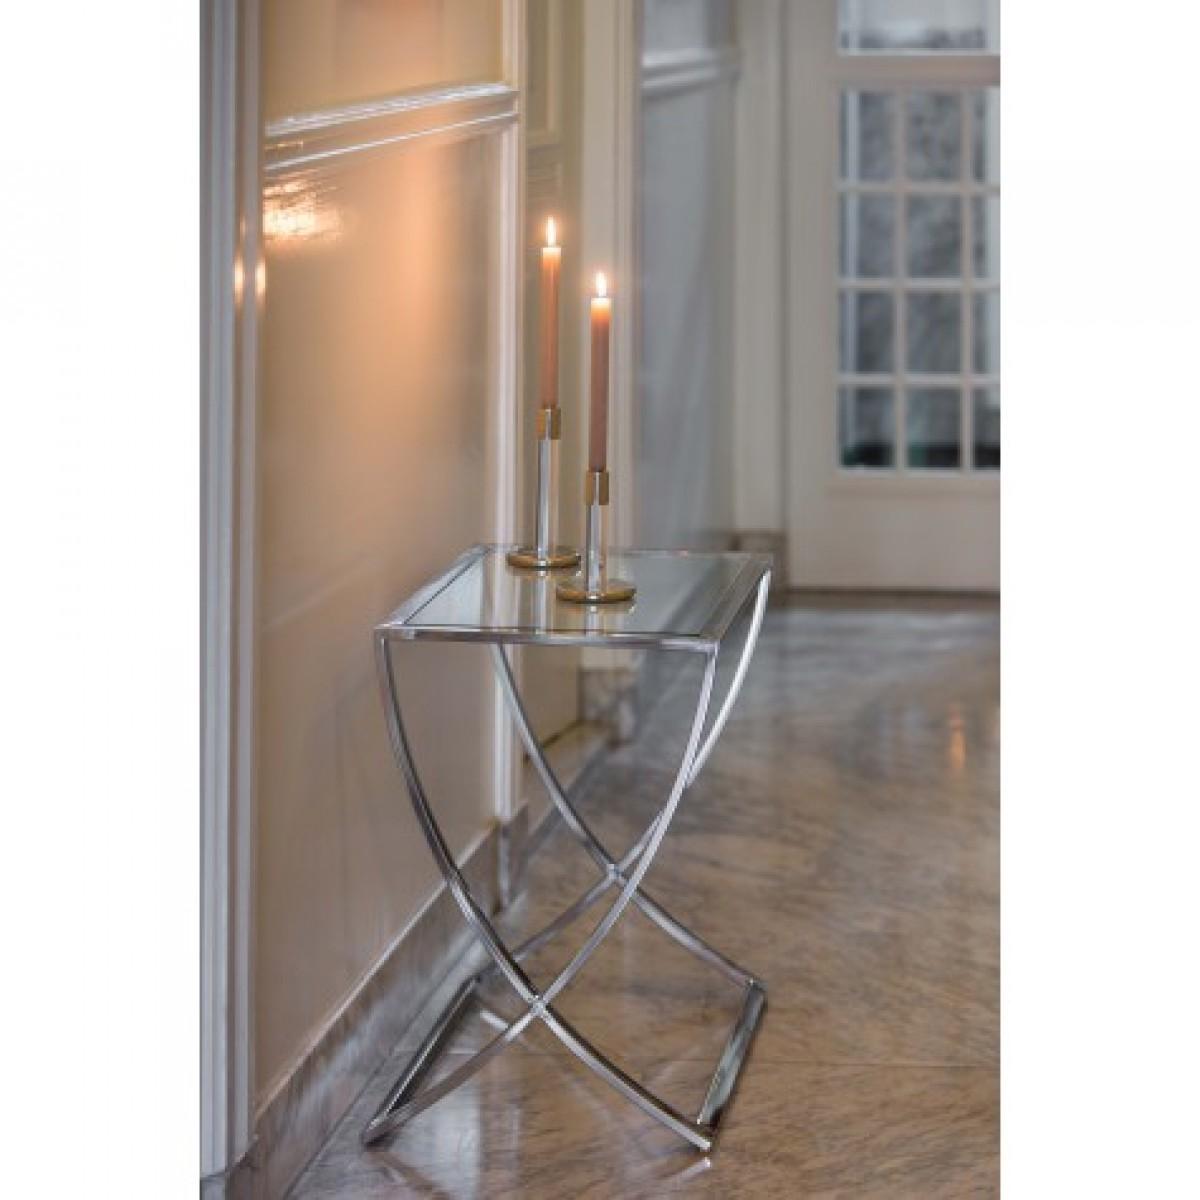 wandtisch silber glas metall verchromt konsole verchromt glas ma e 120x40 cm sideboards. Black Bedroom Furniture Sets. Home Design Ideas